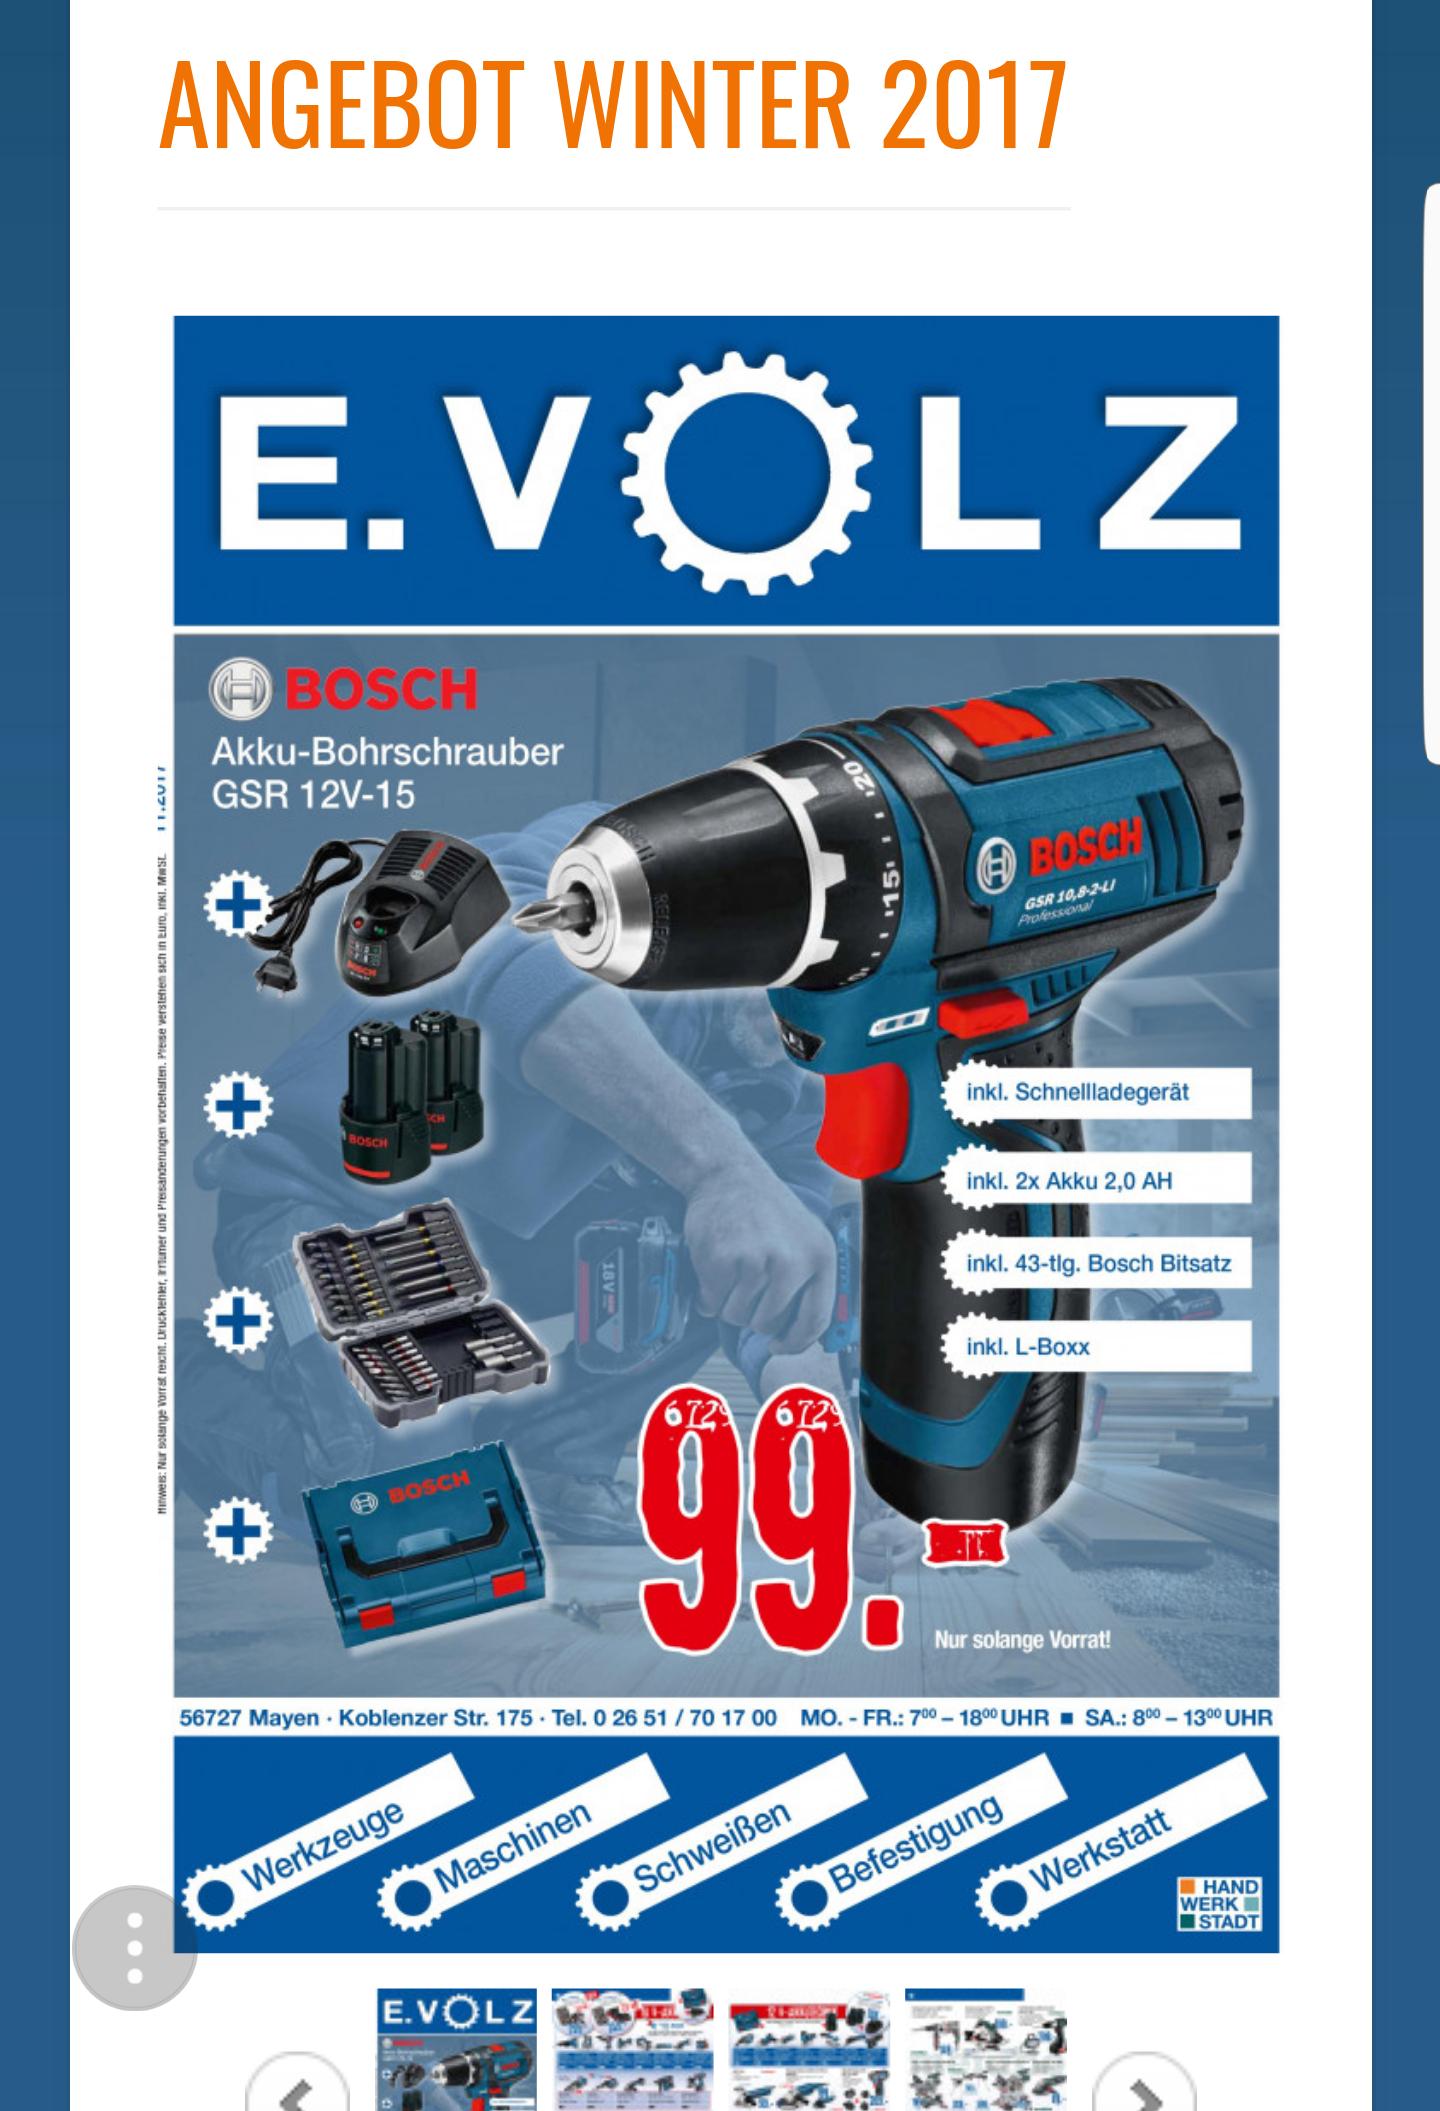 [Lokal Mayen] Bosch GSR12V-15, 2x2.0Ah, L-Boxx,43 tlg Bitset